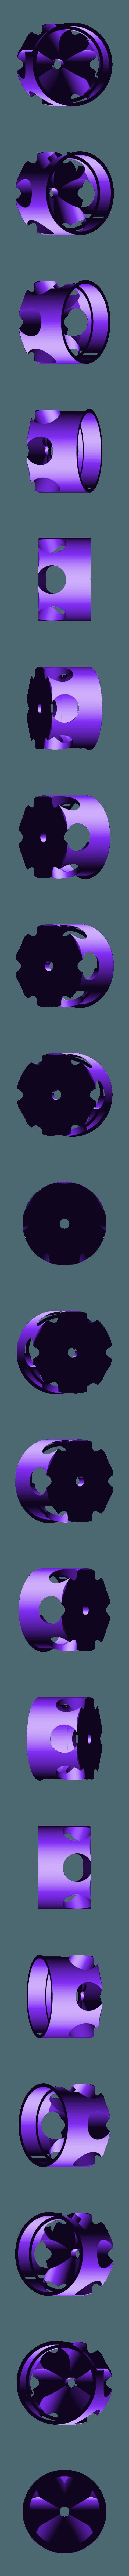 dispenser_bottom.stl Download free STL file Little Bird Feeder Air Temple • 3D printer model, Job